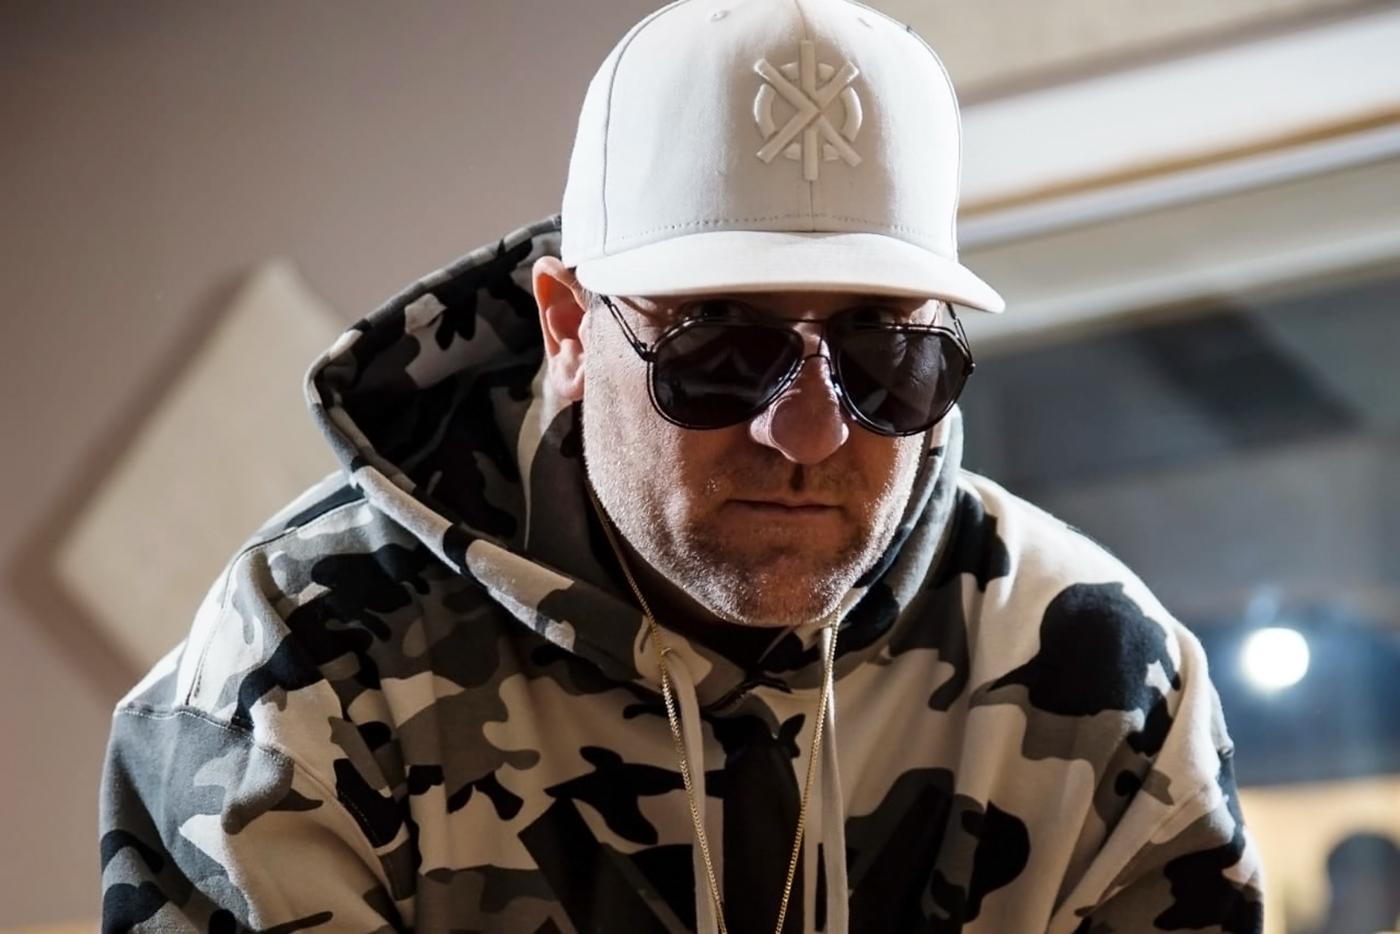 Winter Is Here: Inside the Return of 'Informer' Rapper Snow